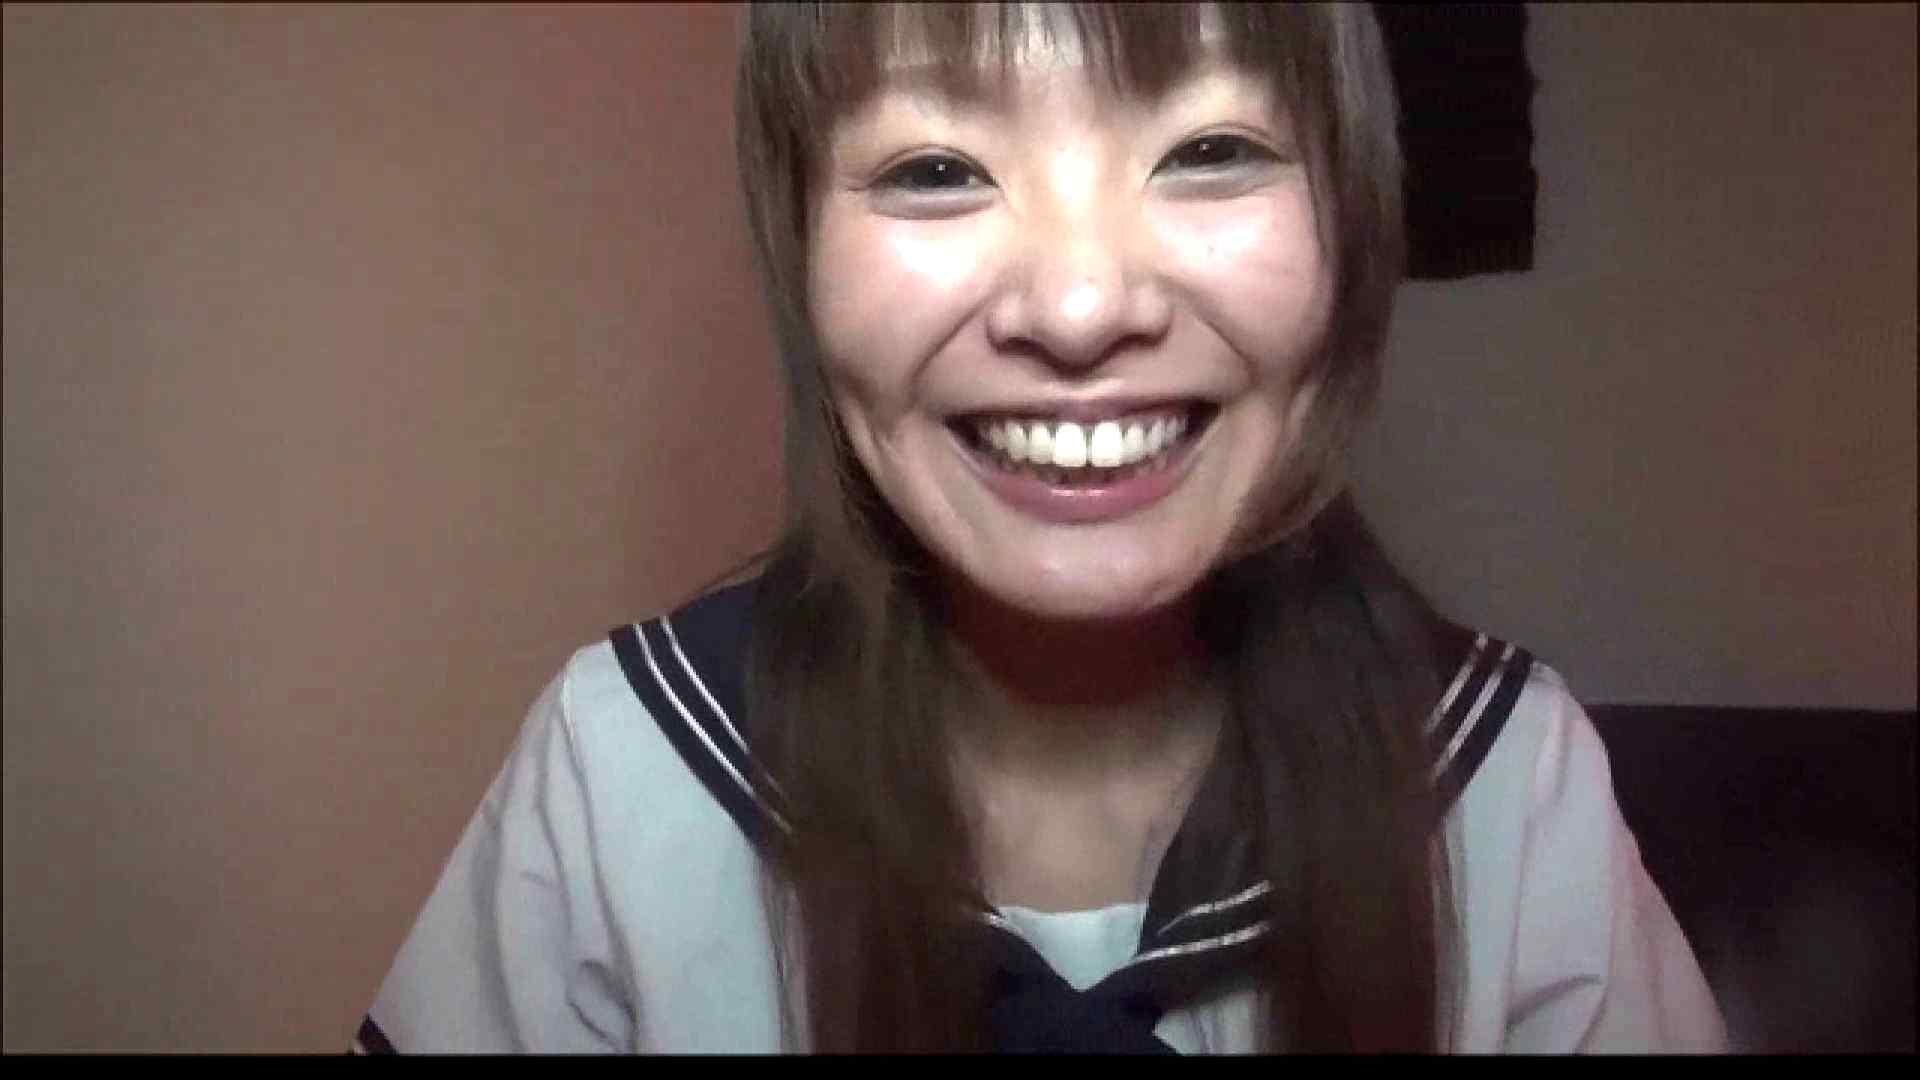 ハメ撮り天国 Vol.28 流出作品  44連発 12